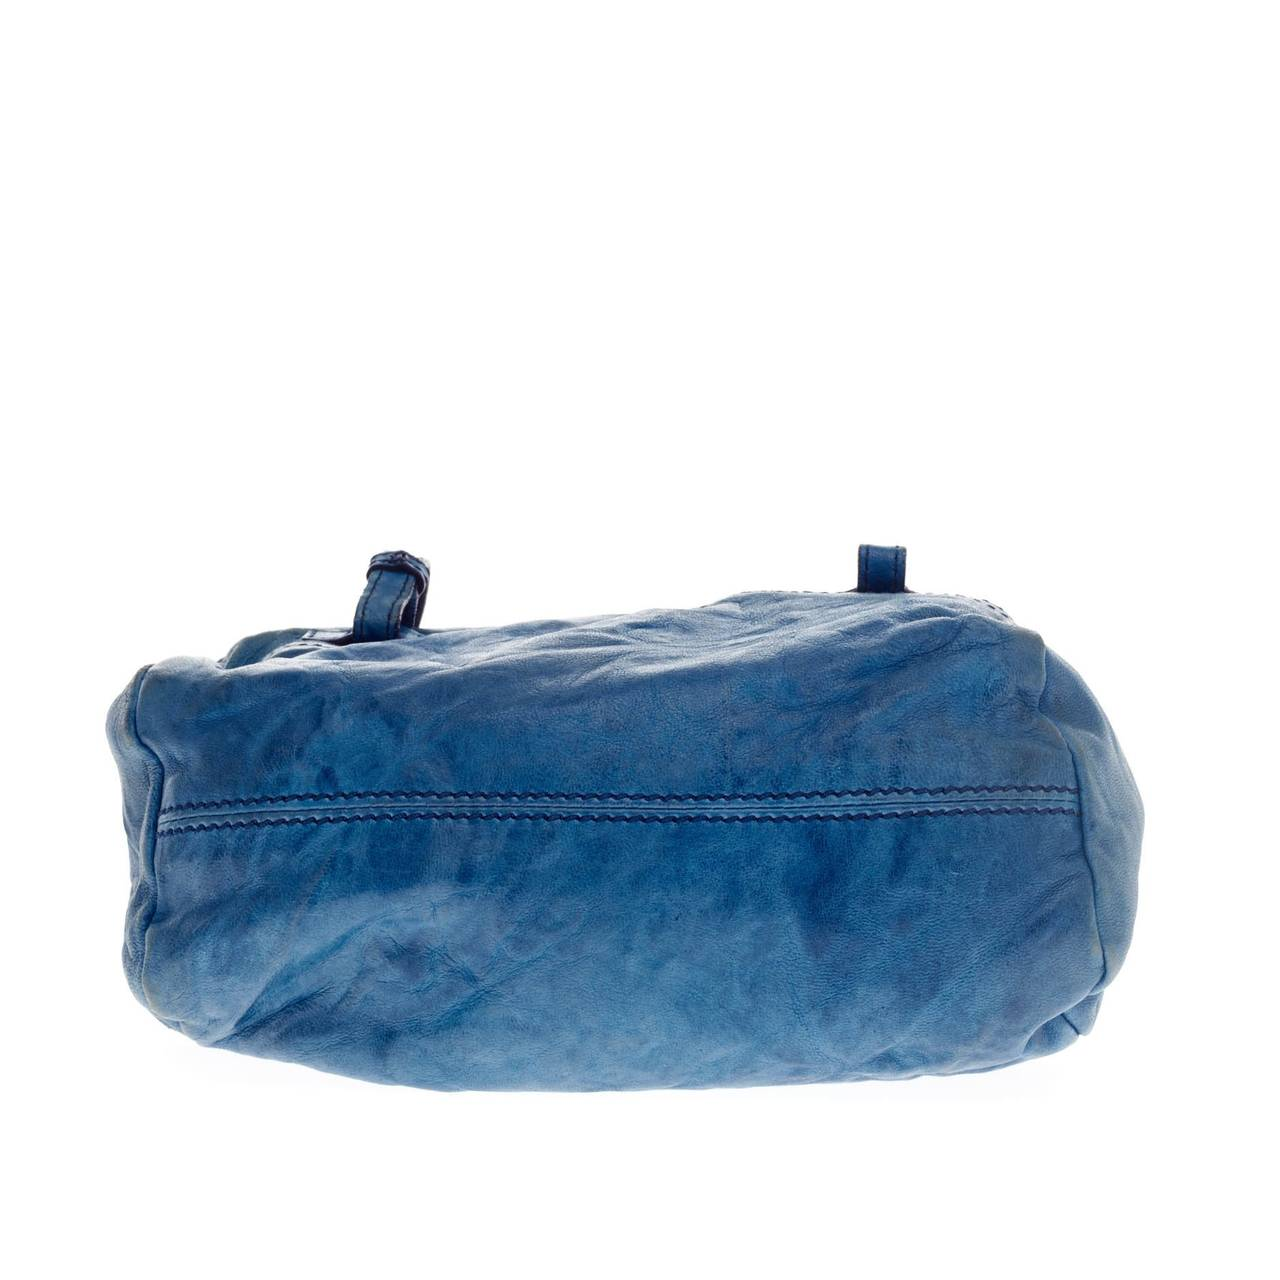 Givenchy Pandora Bag Leather Mini 5